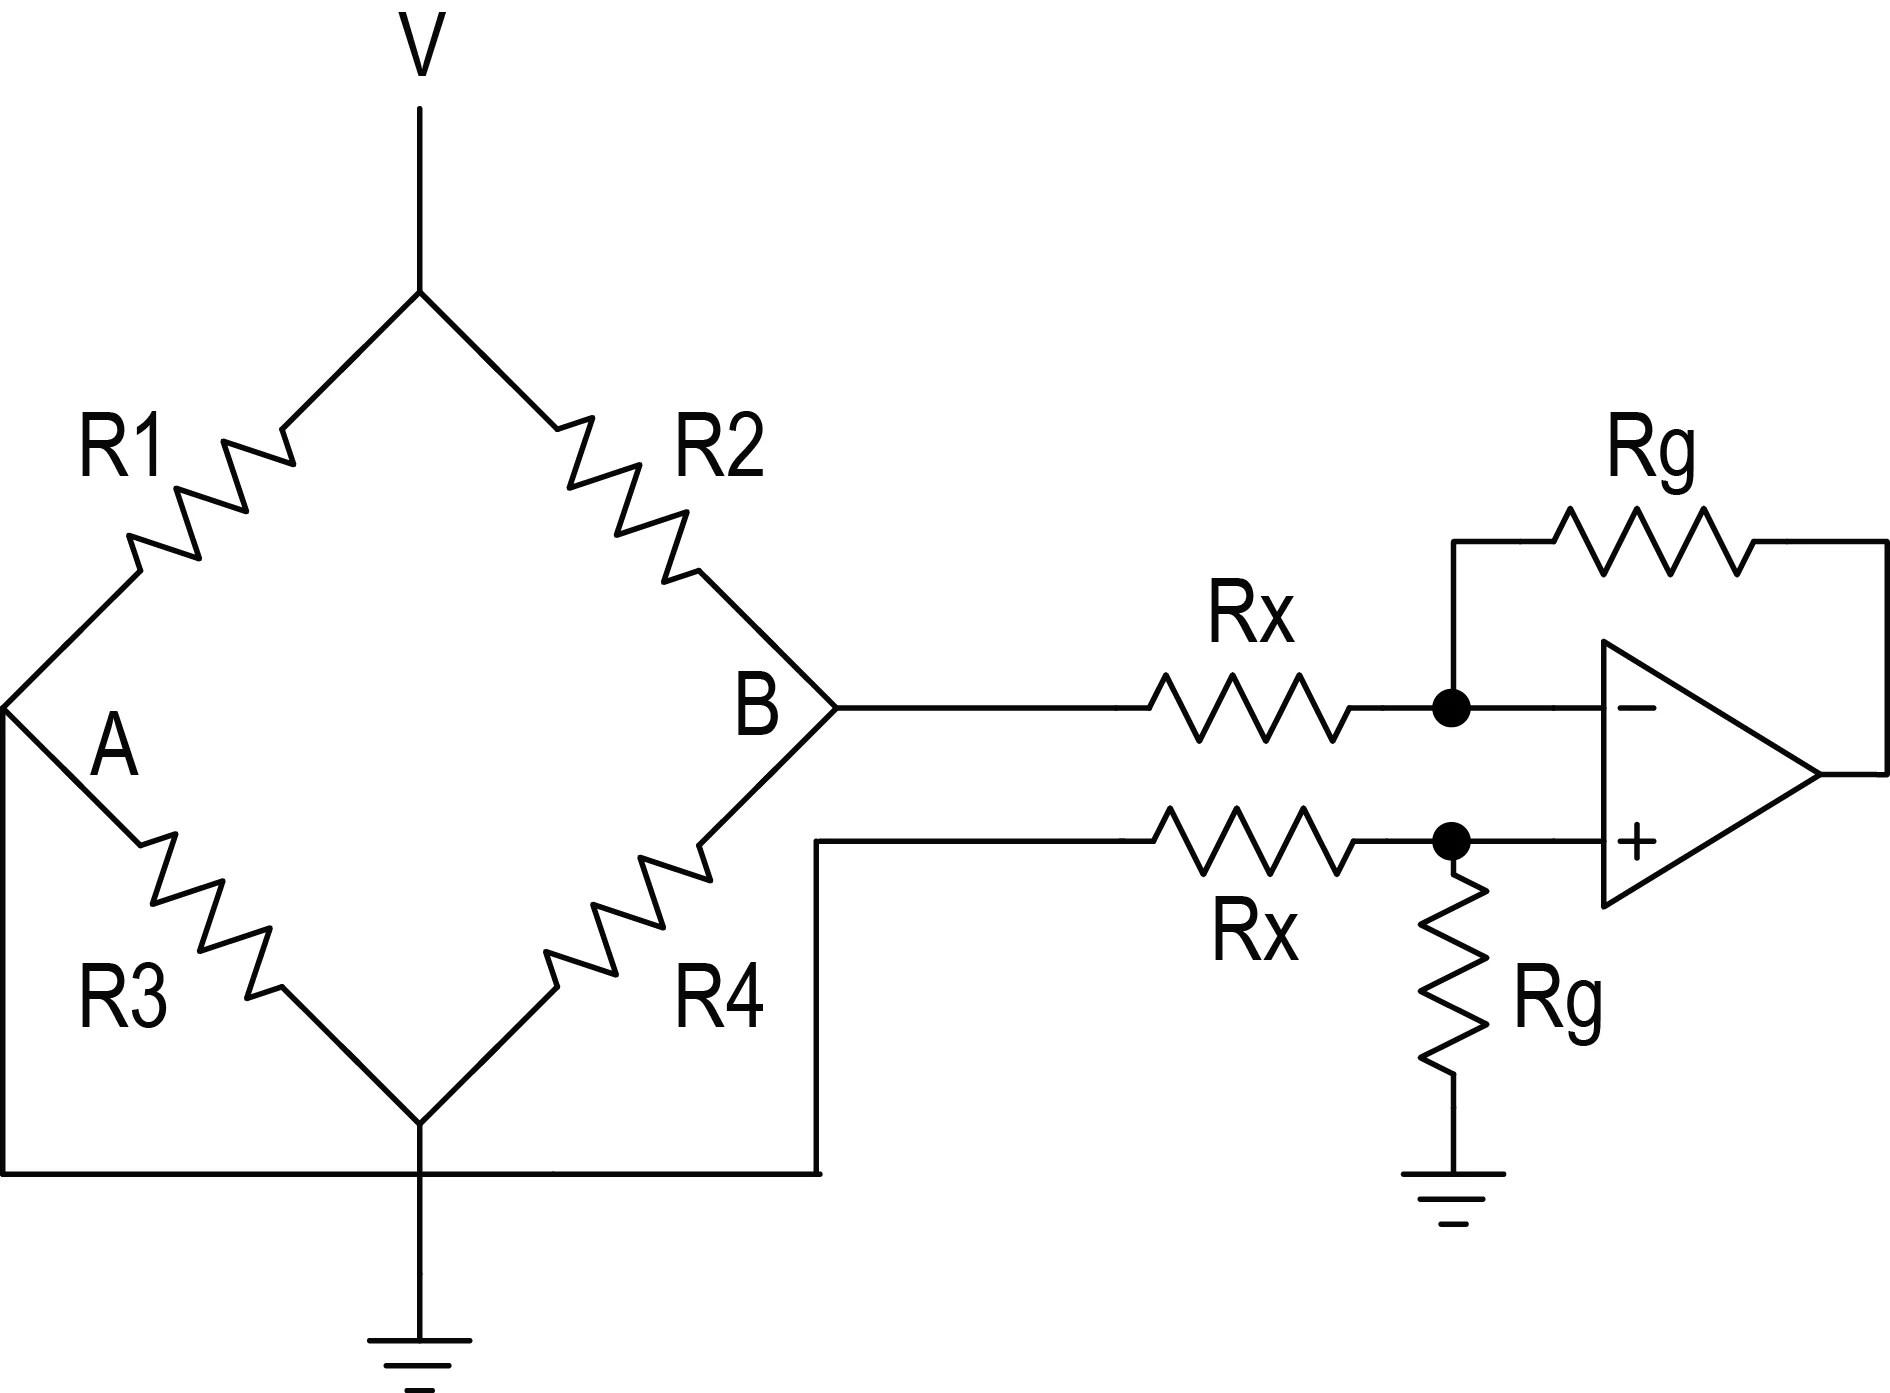 strain gauge wiring diagram bmw 1 series fuse design notebook linearization of a wheatstone bridge